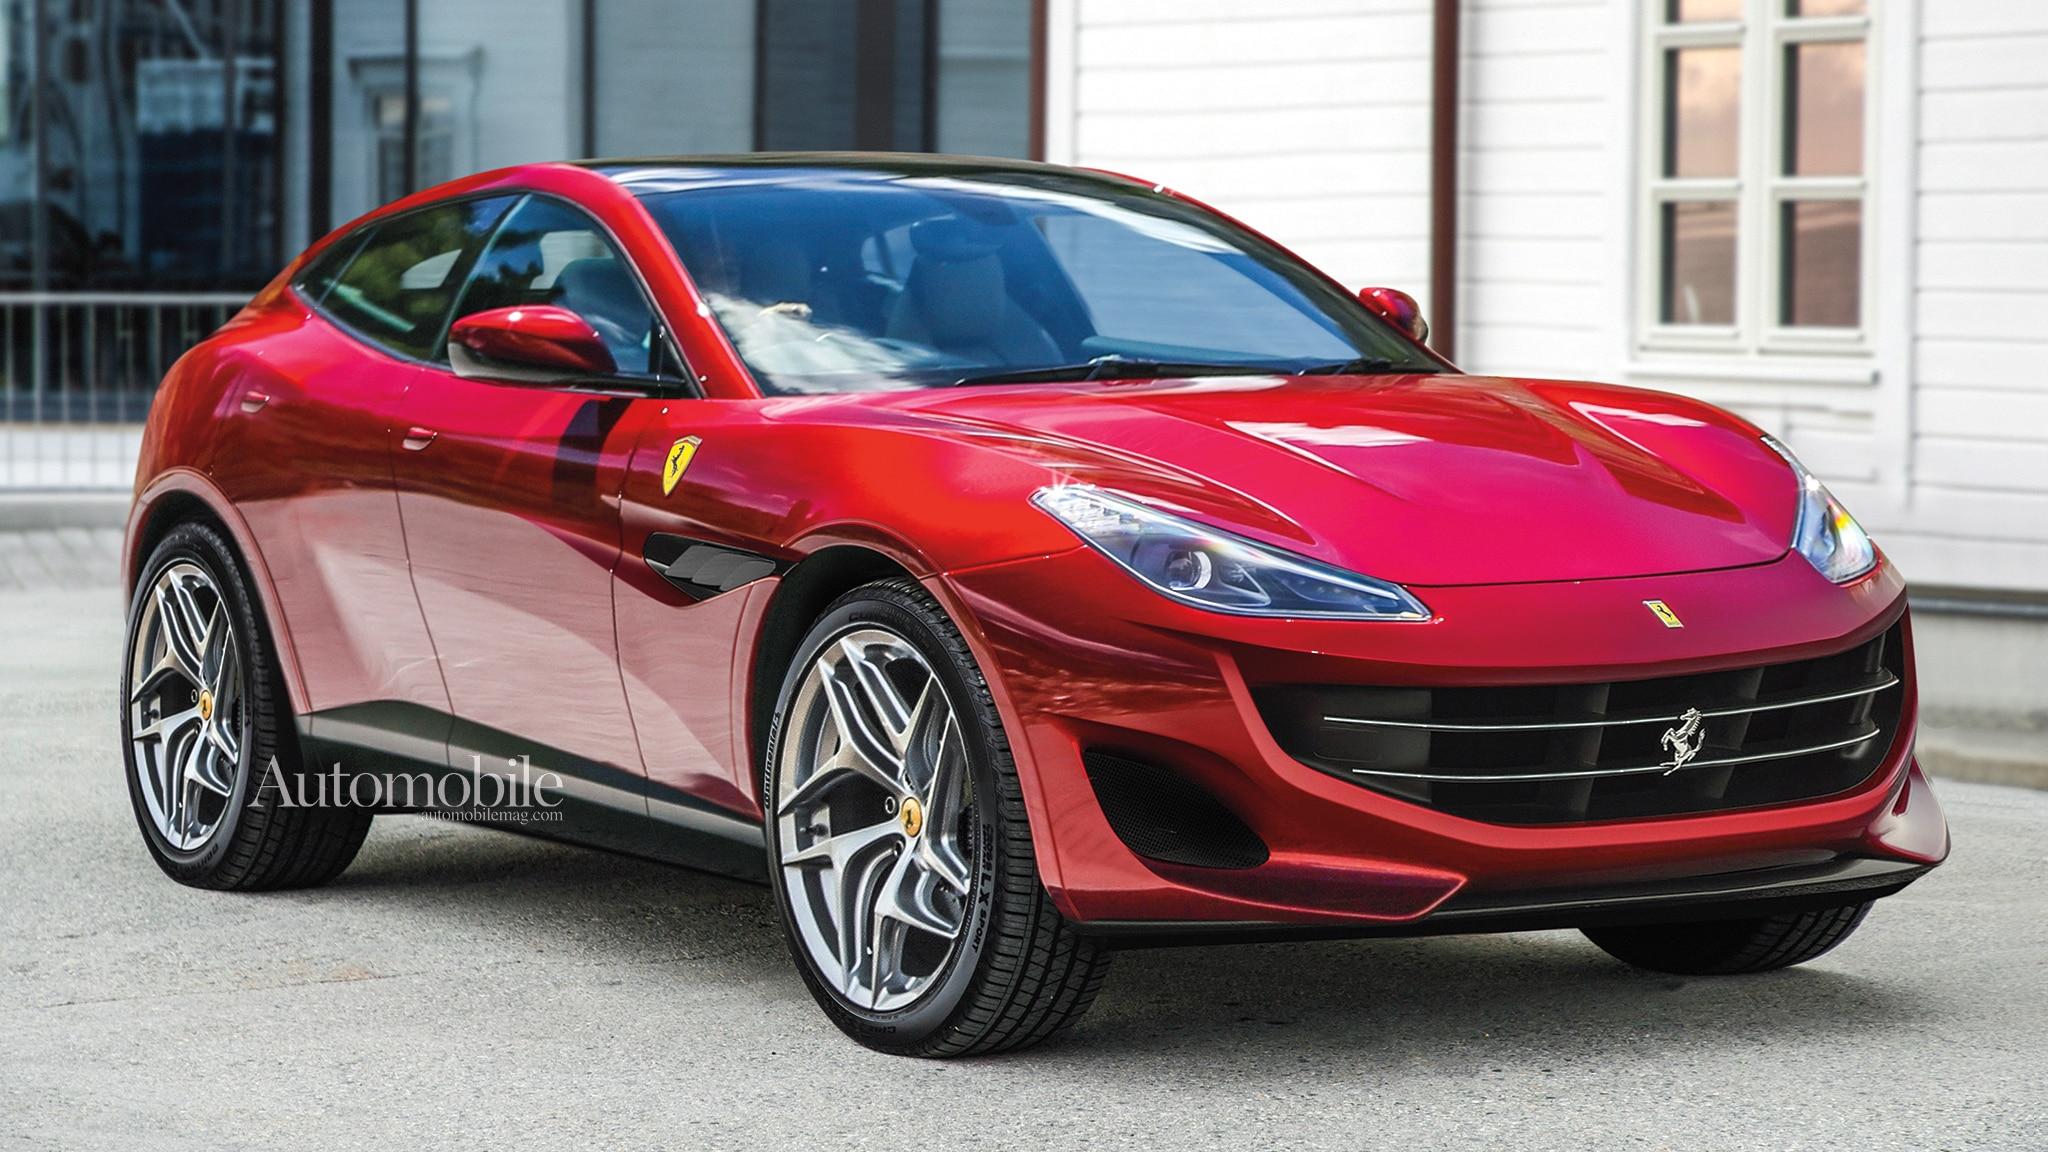 2022 Ferrari Purosangue SUV: Renderings + Rumors ...